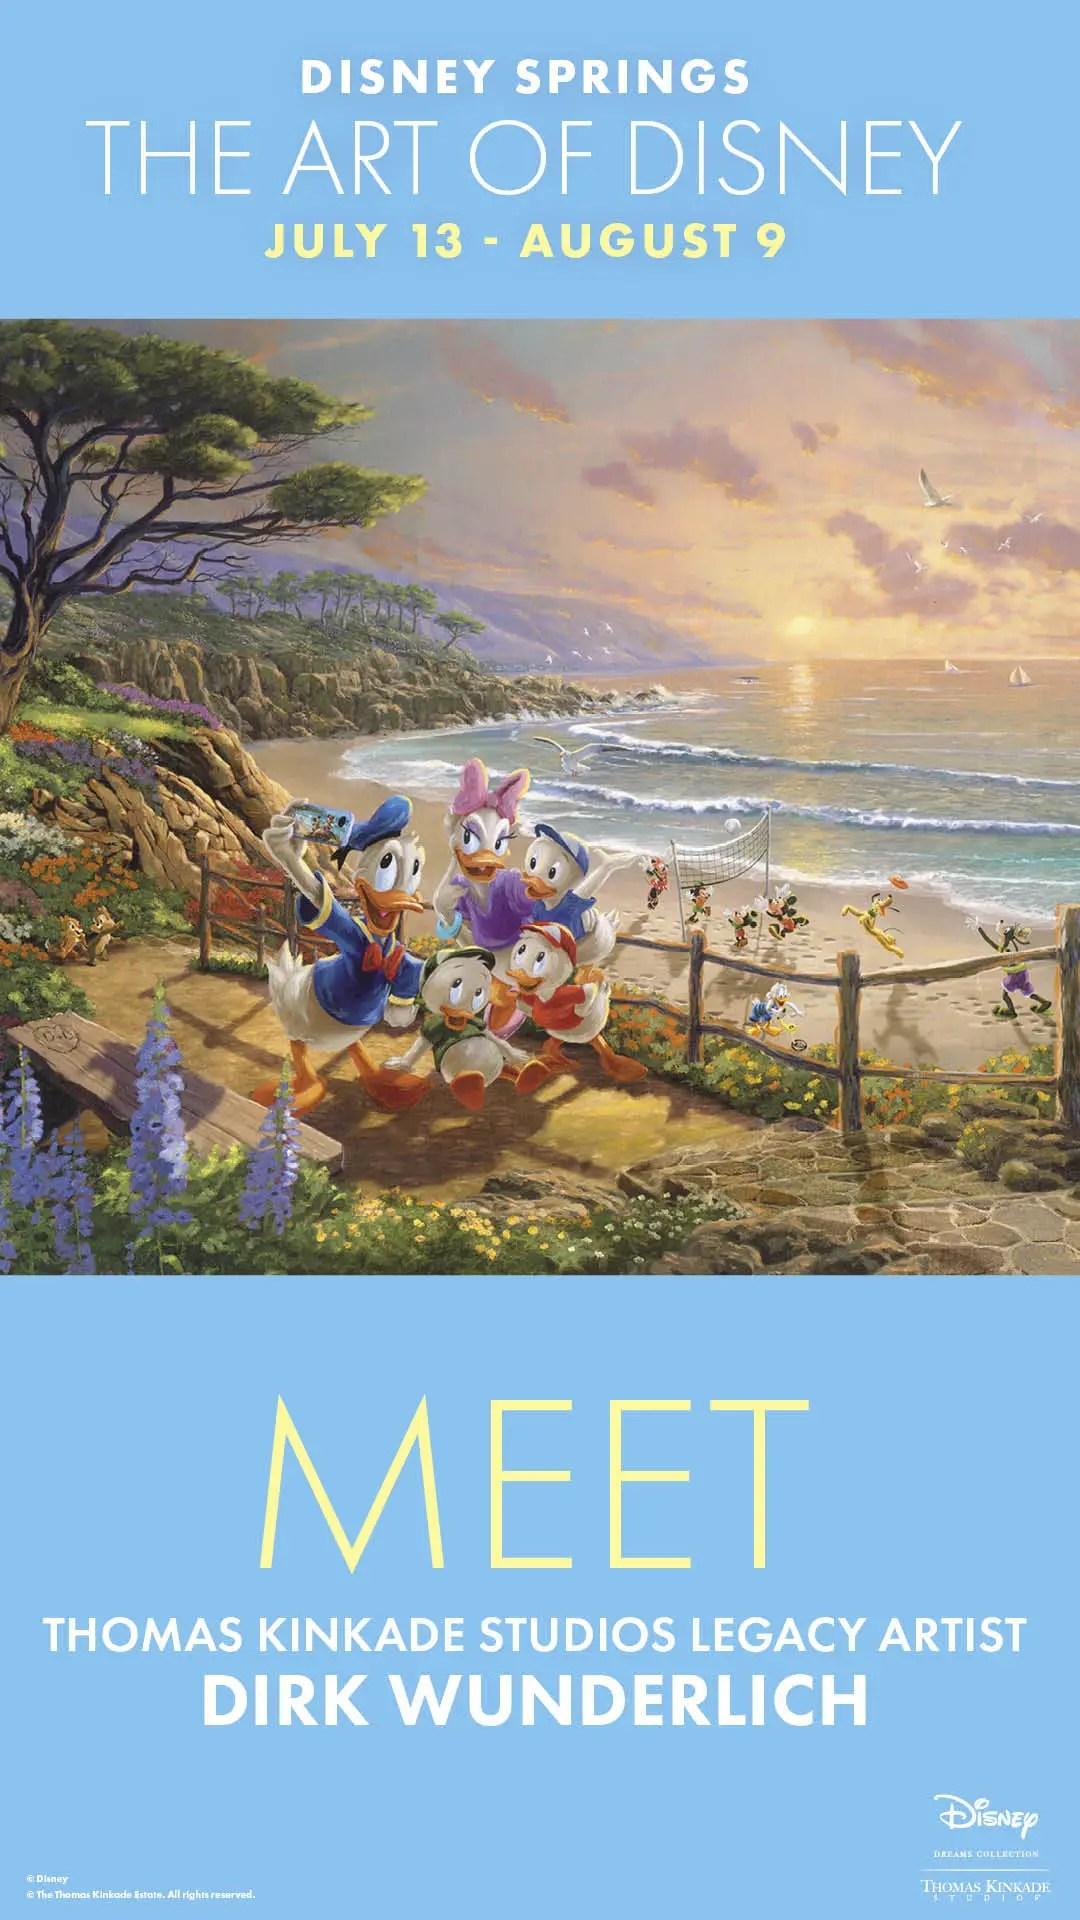 Thomas Kinkade Studios Legacy Artist Dirk Wunderlich will be making appearances at The Art of Disney in Disney Springs. 1